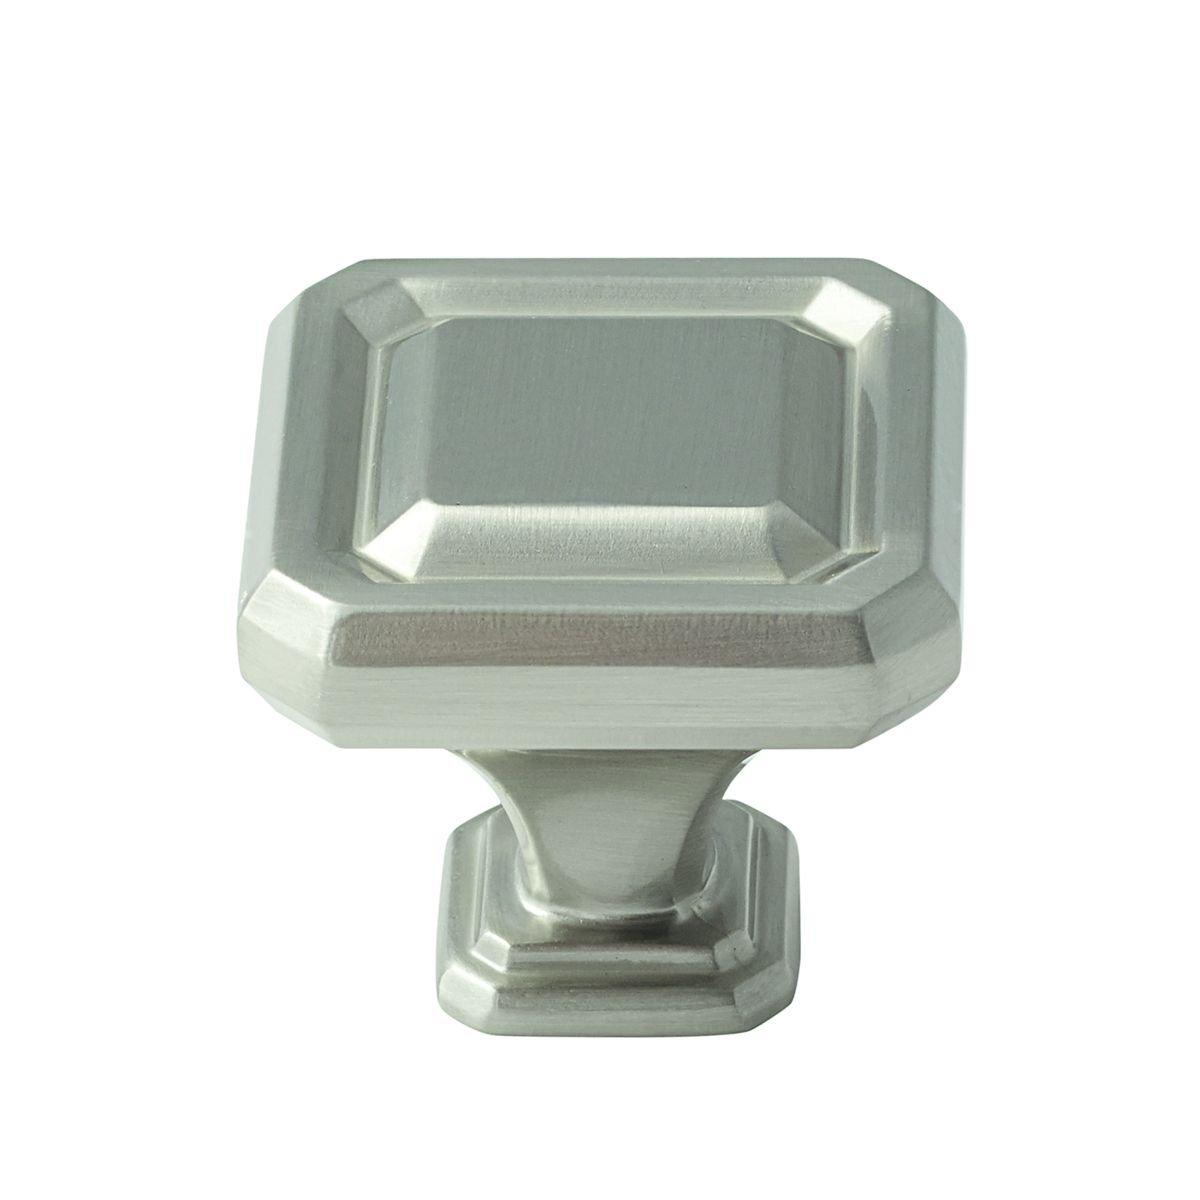 Amerock BP36547G10 100 Pack 1-1/2in. Wells LGTH Knob, Satin Nickel